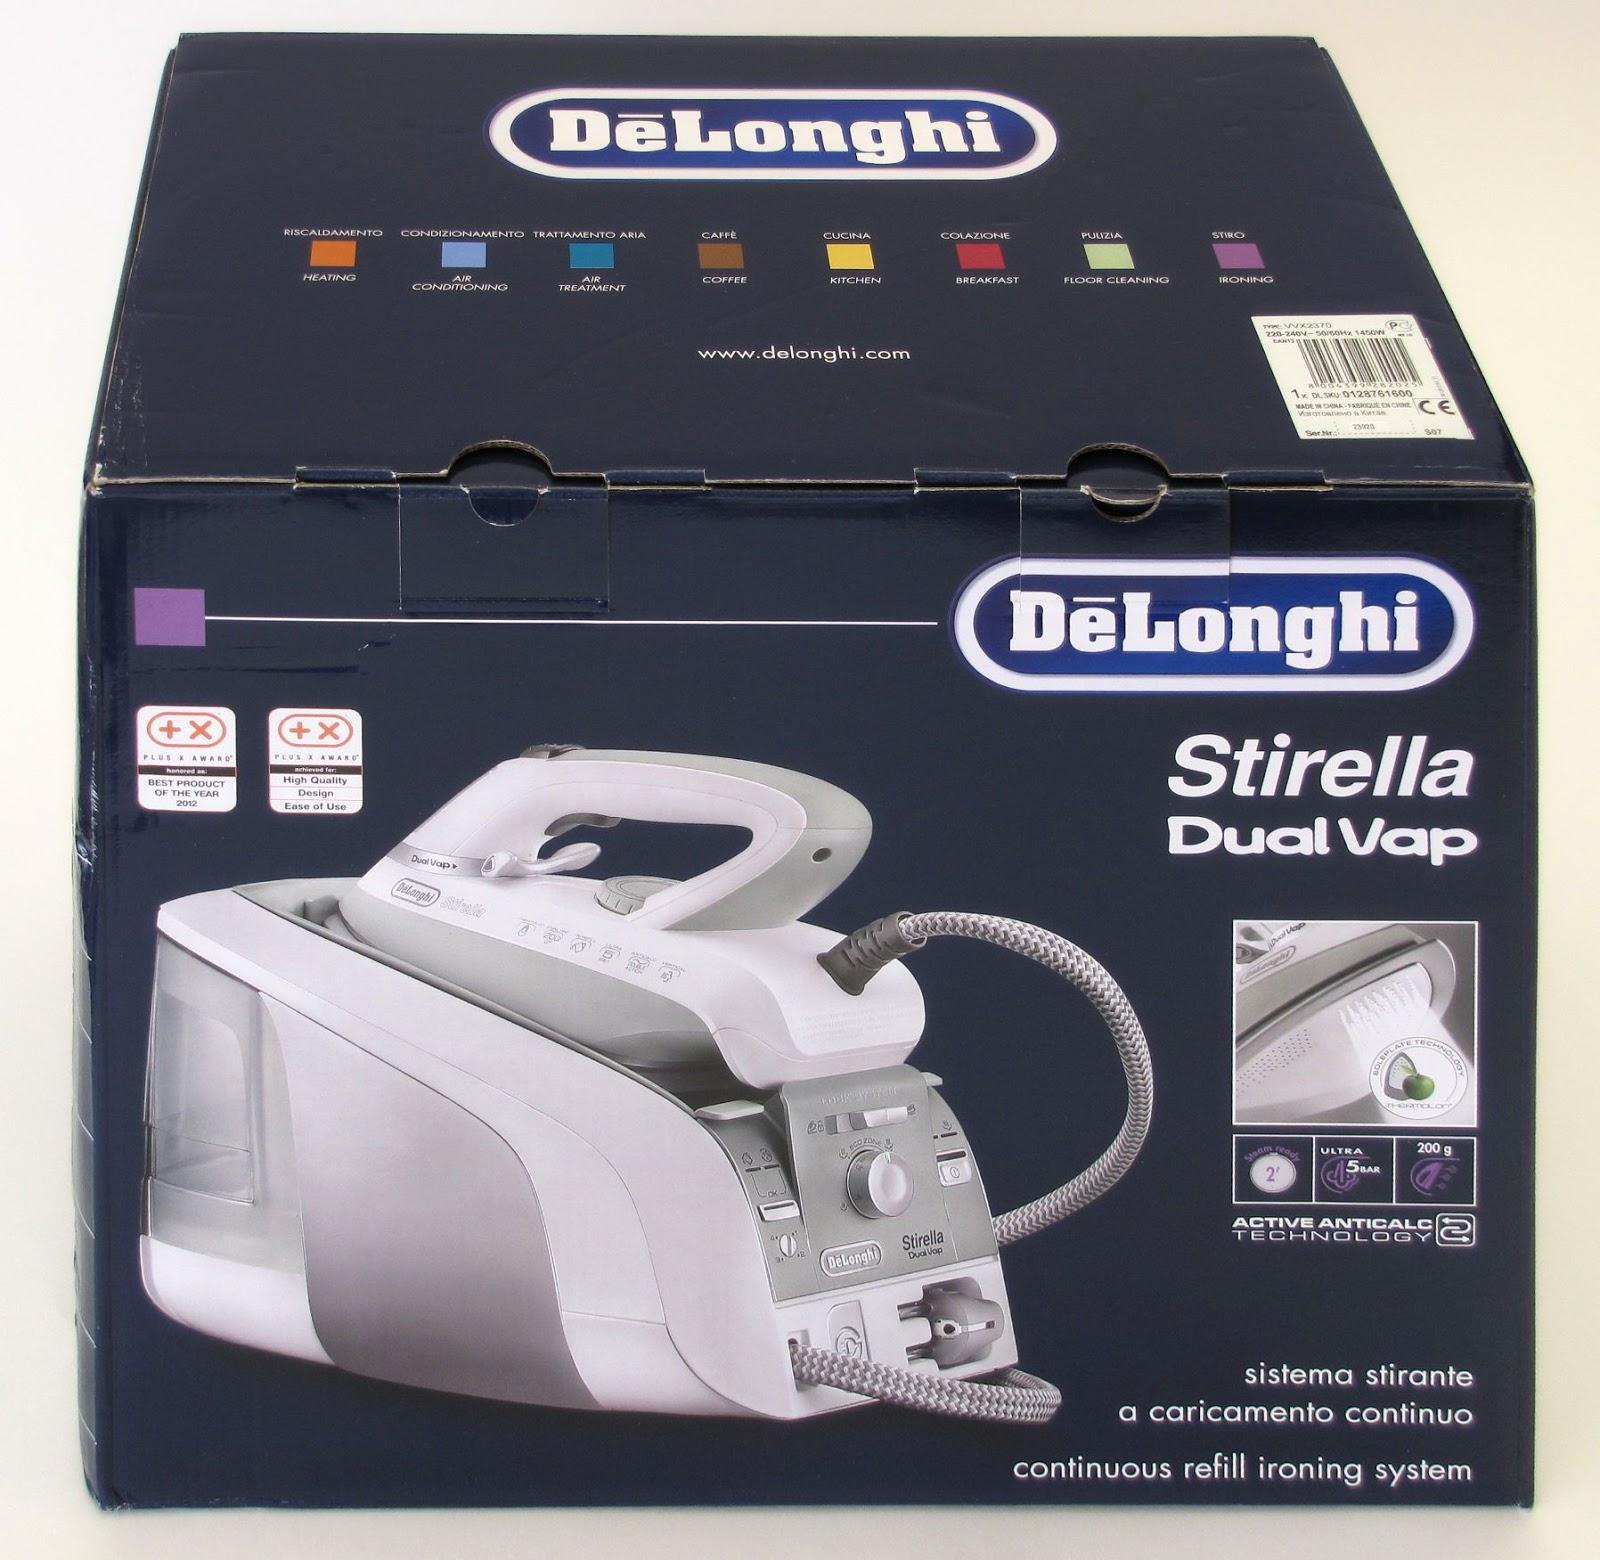 De Longhi Stirella VVX2370 DualVap, scatola